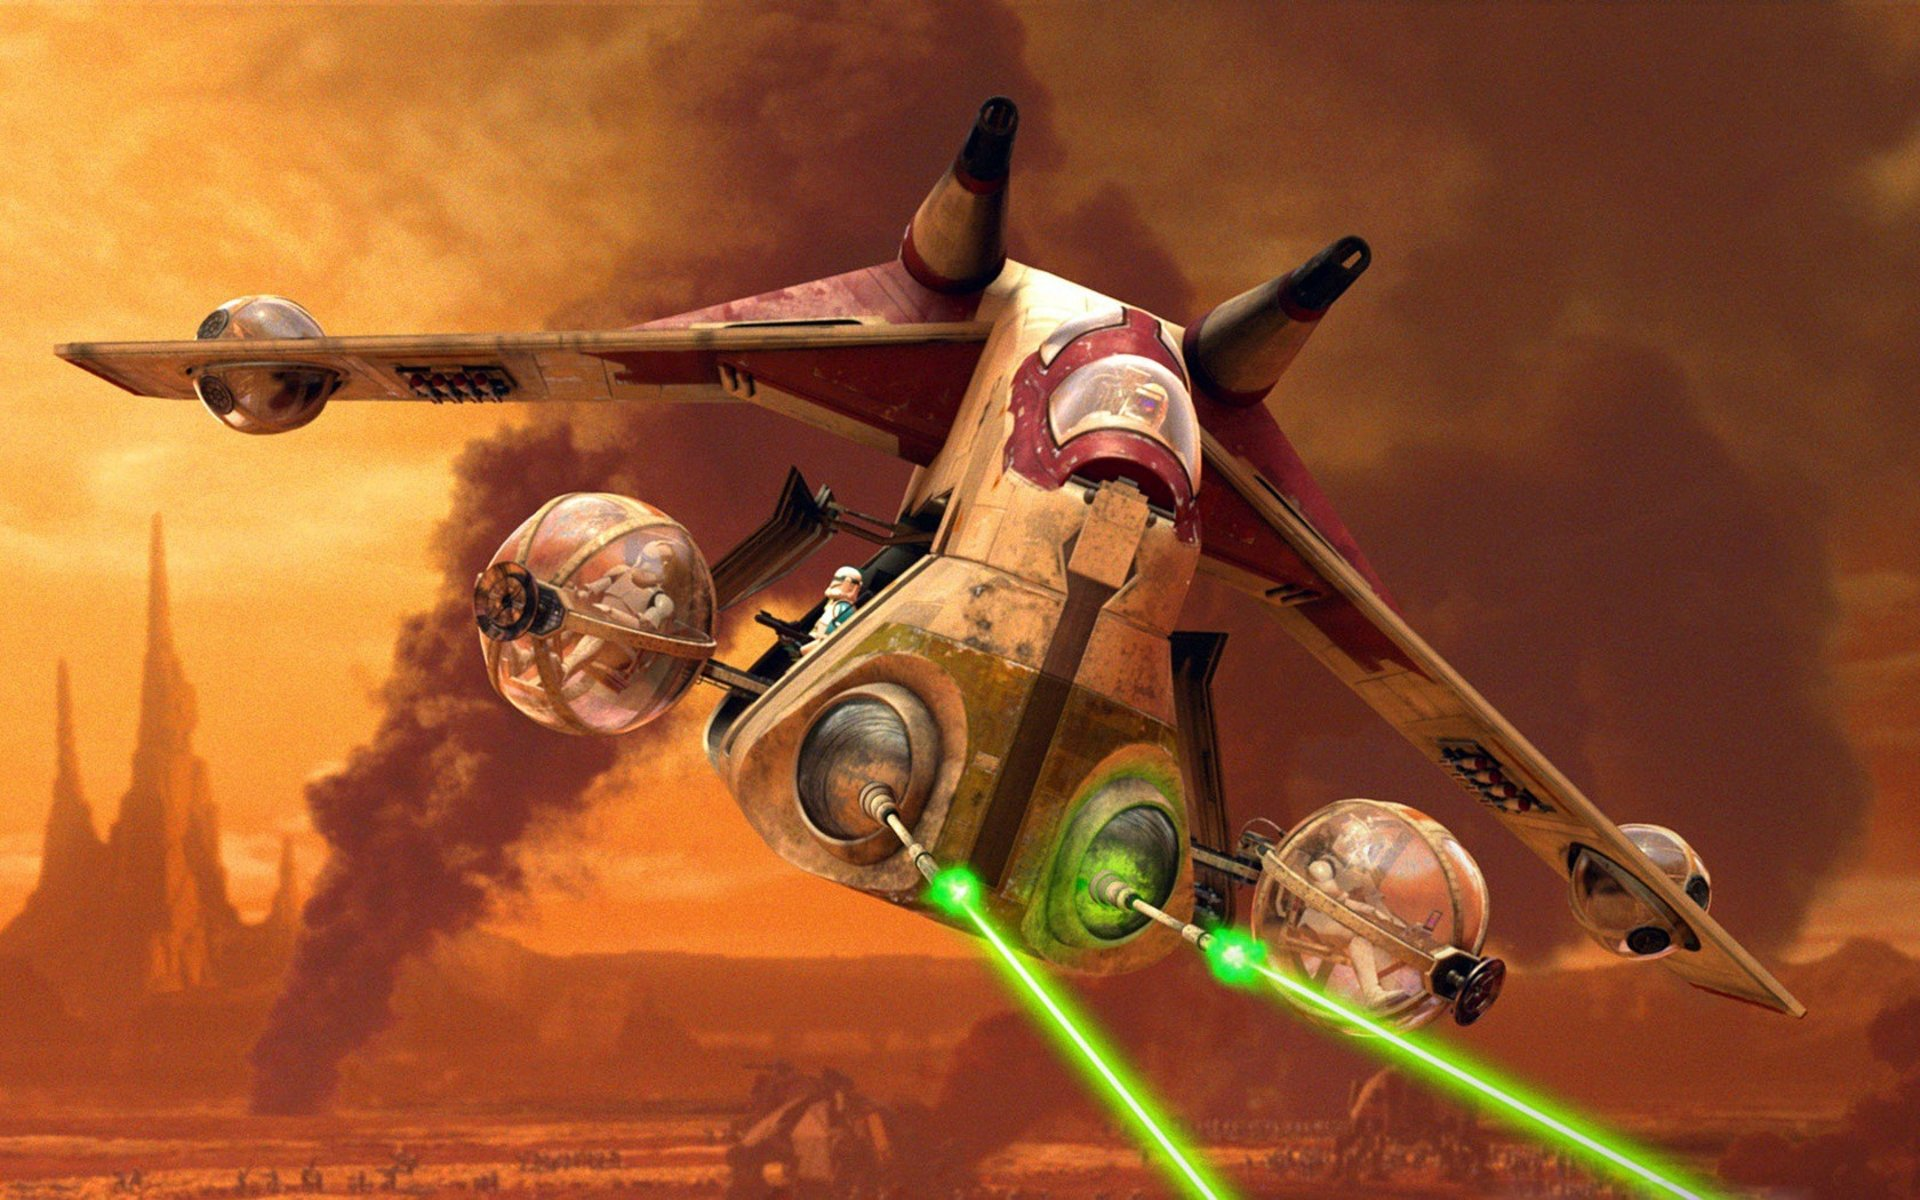 STAR WARS CLONE WARS animation sci fi cartoon futuristic television 1920x1200